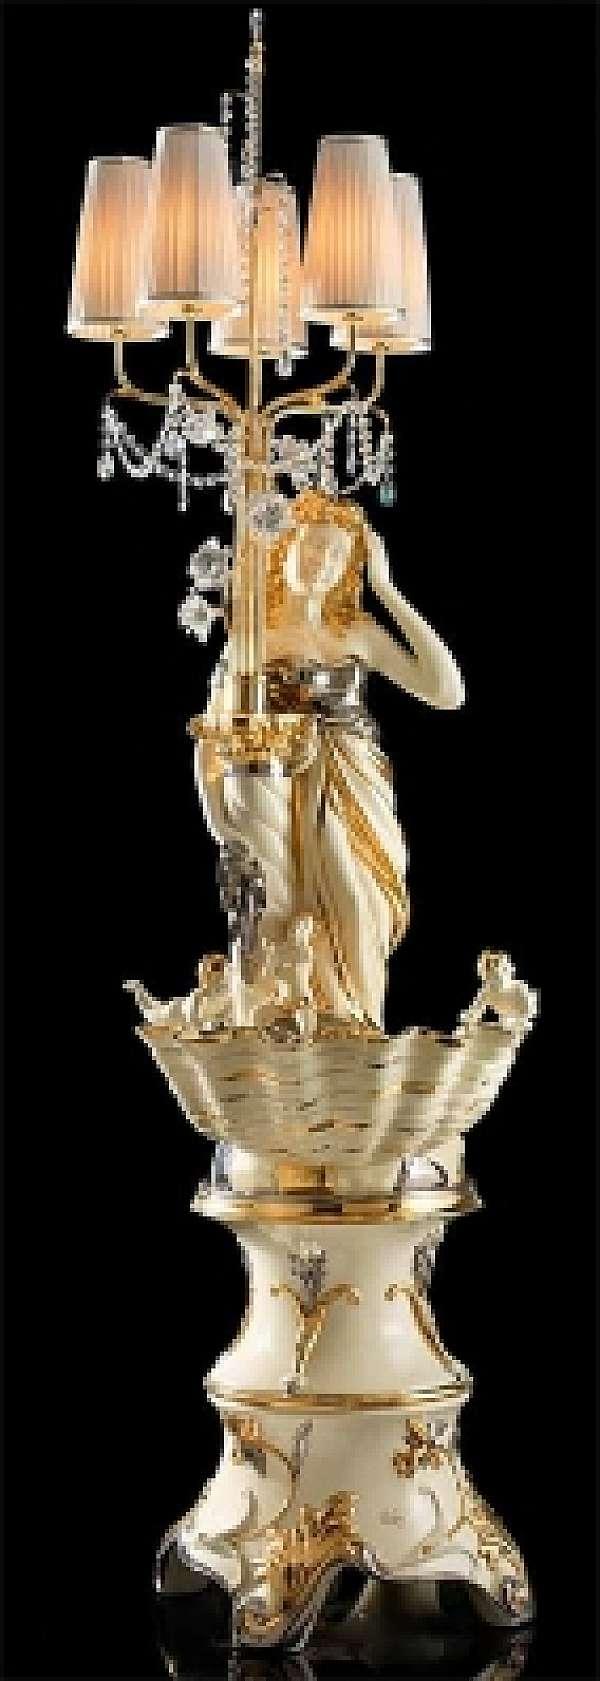 Напольная лампа LORENZON (F.LLI LORENZON) L.422/AVOPLF/5PA ARTE E CERAMICA